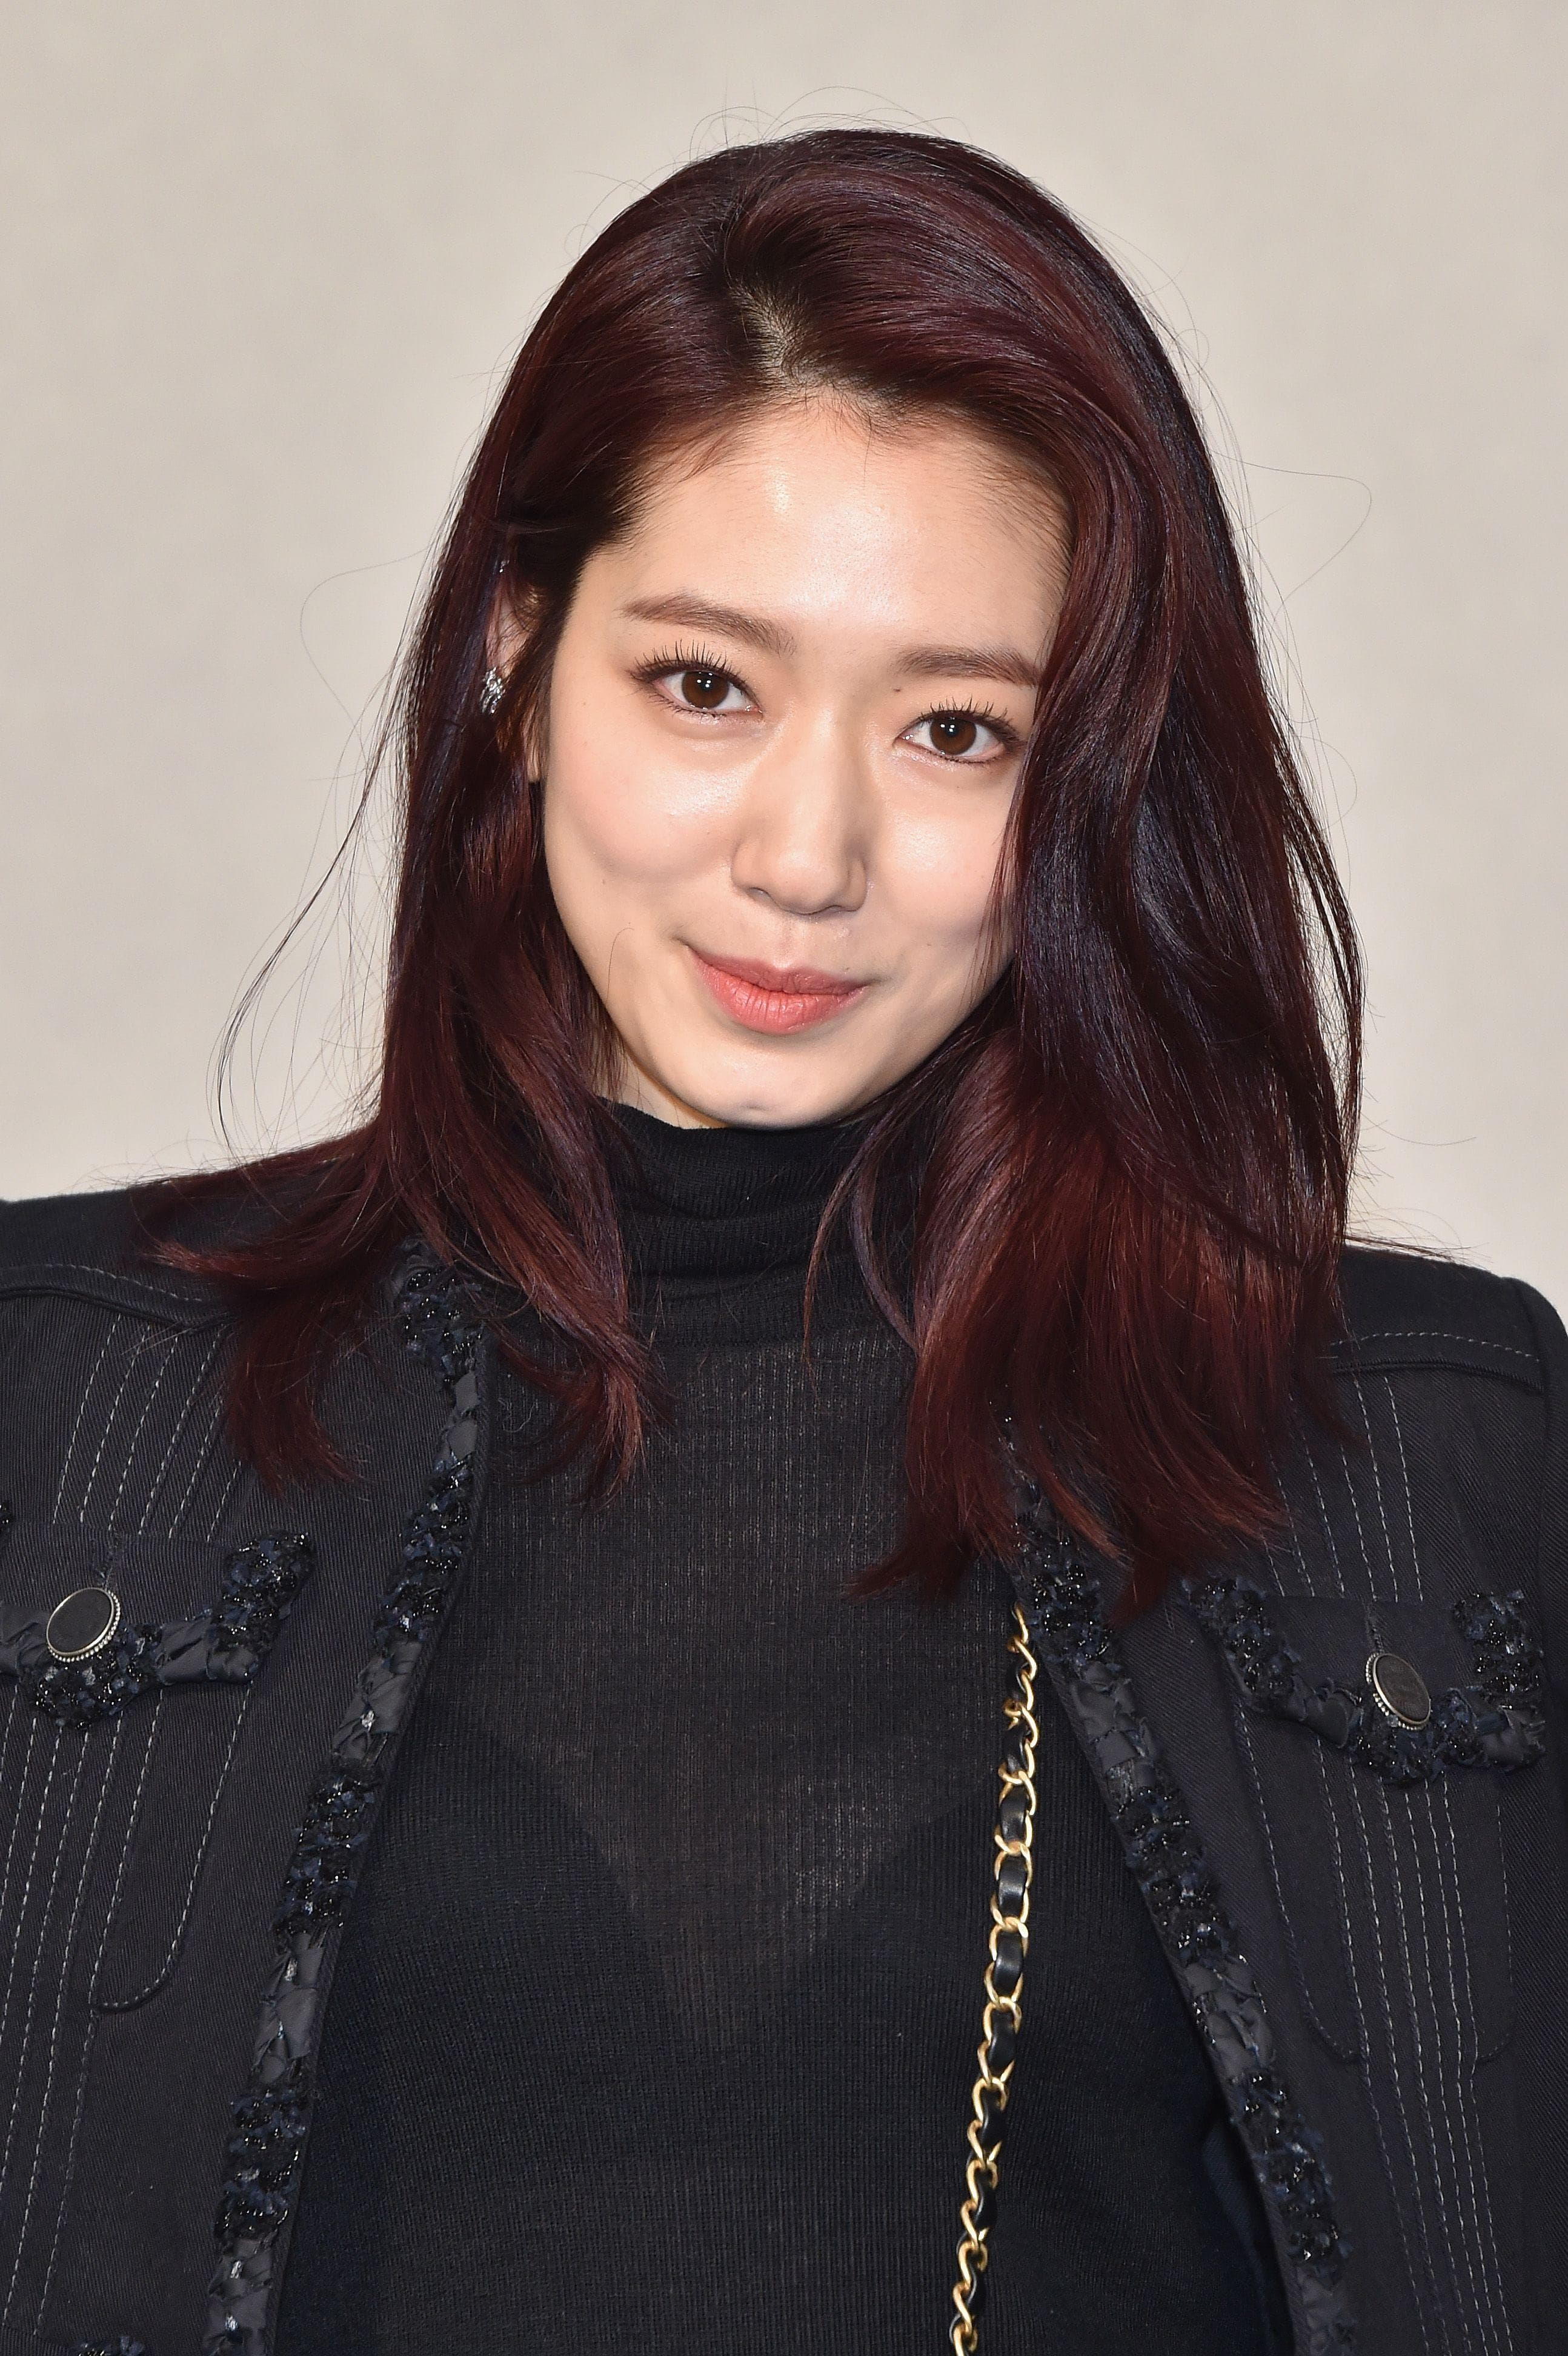 Image of Random Best K-Drama Actresses